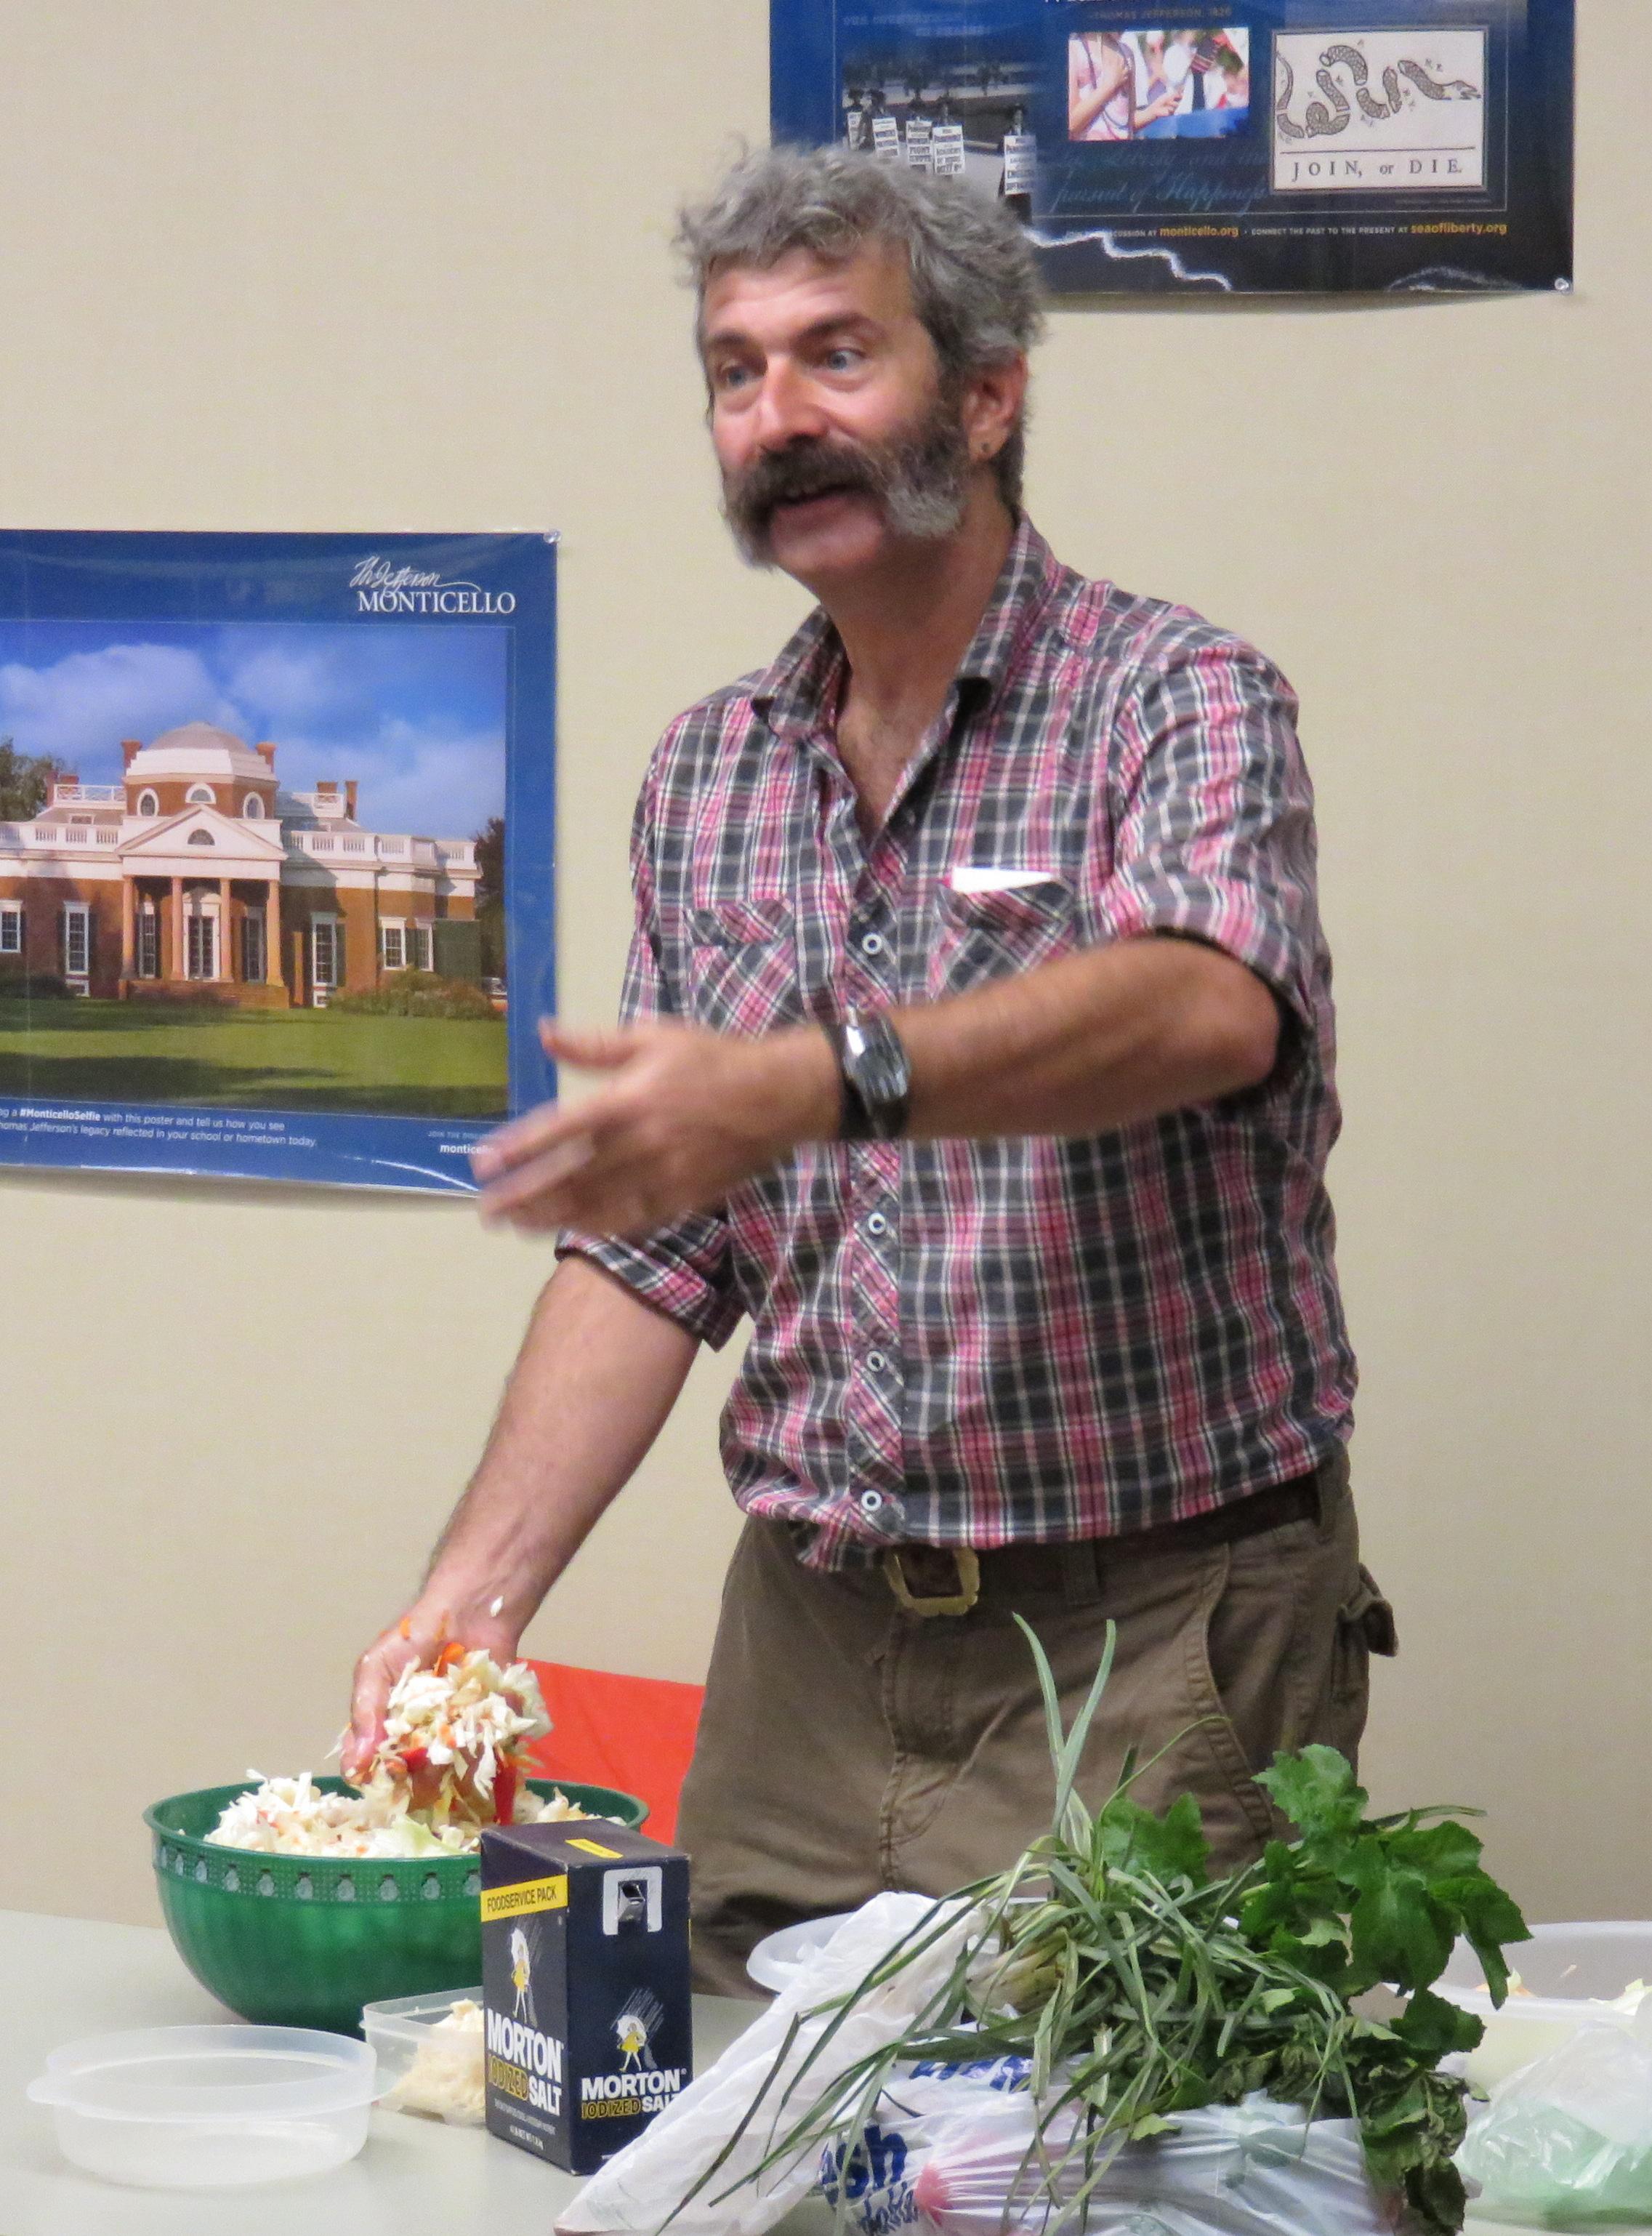 Sandor Katz doing a fermentation workshop at the Monticello Heritage Harvest Festival, 12 September 2015